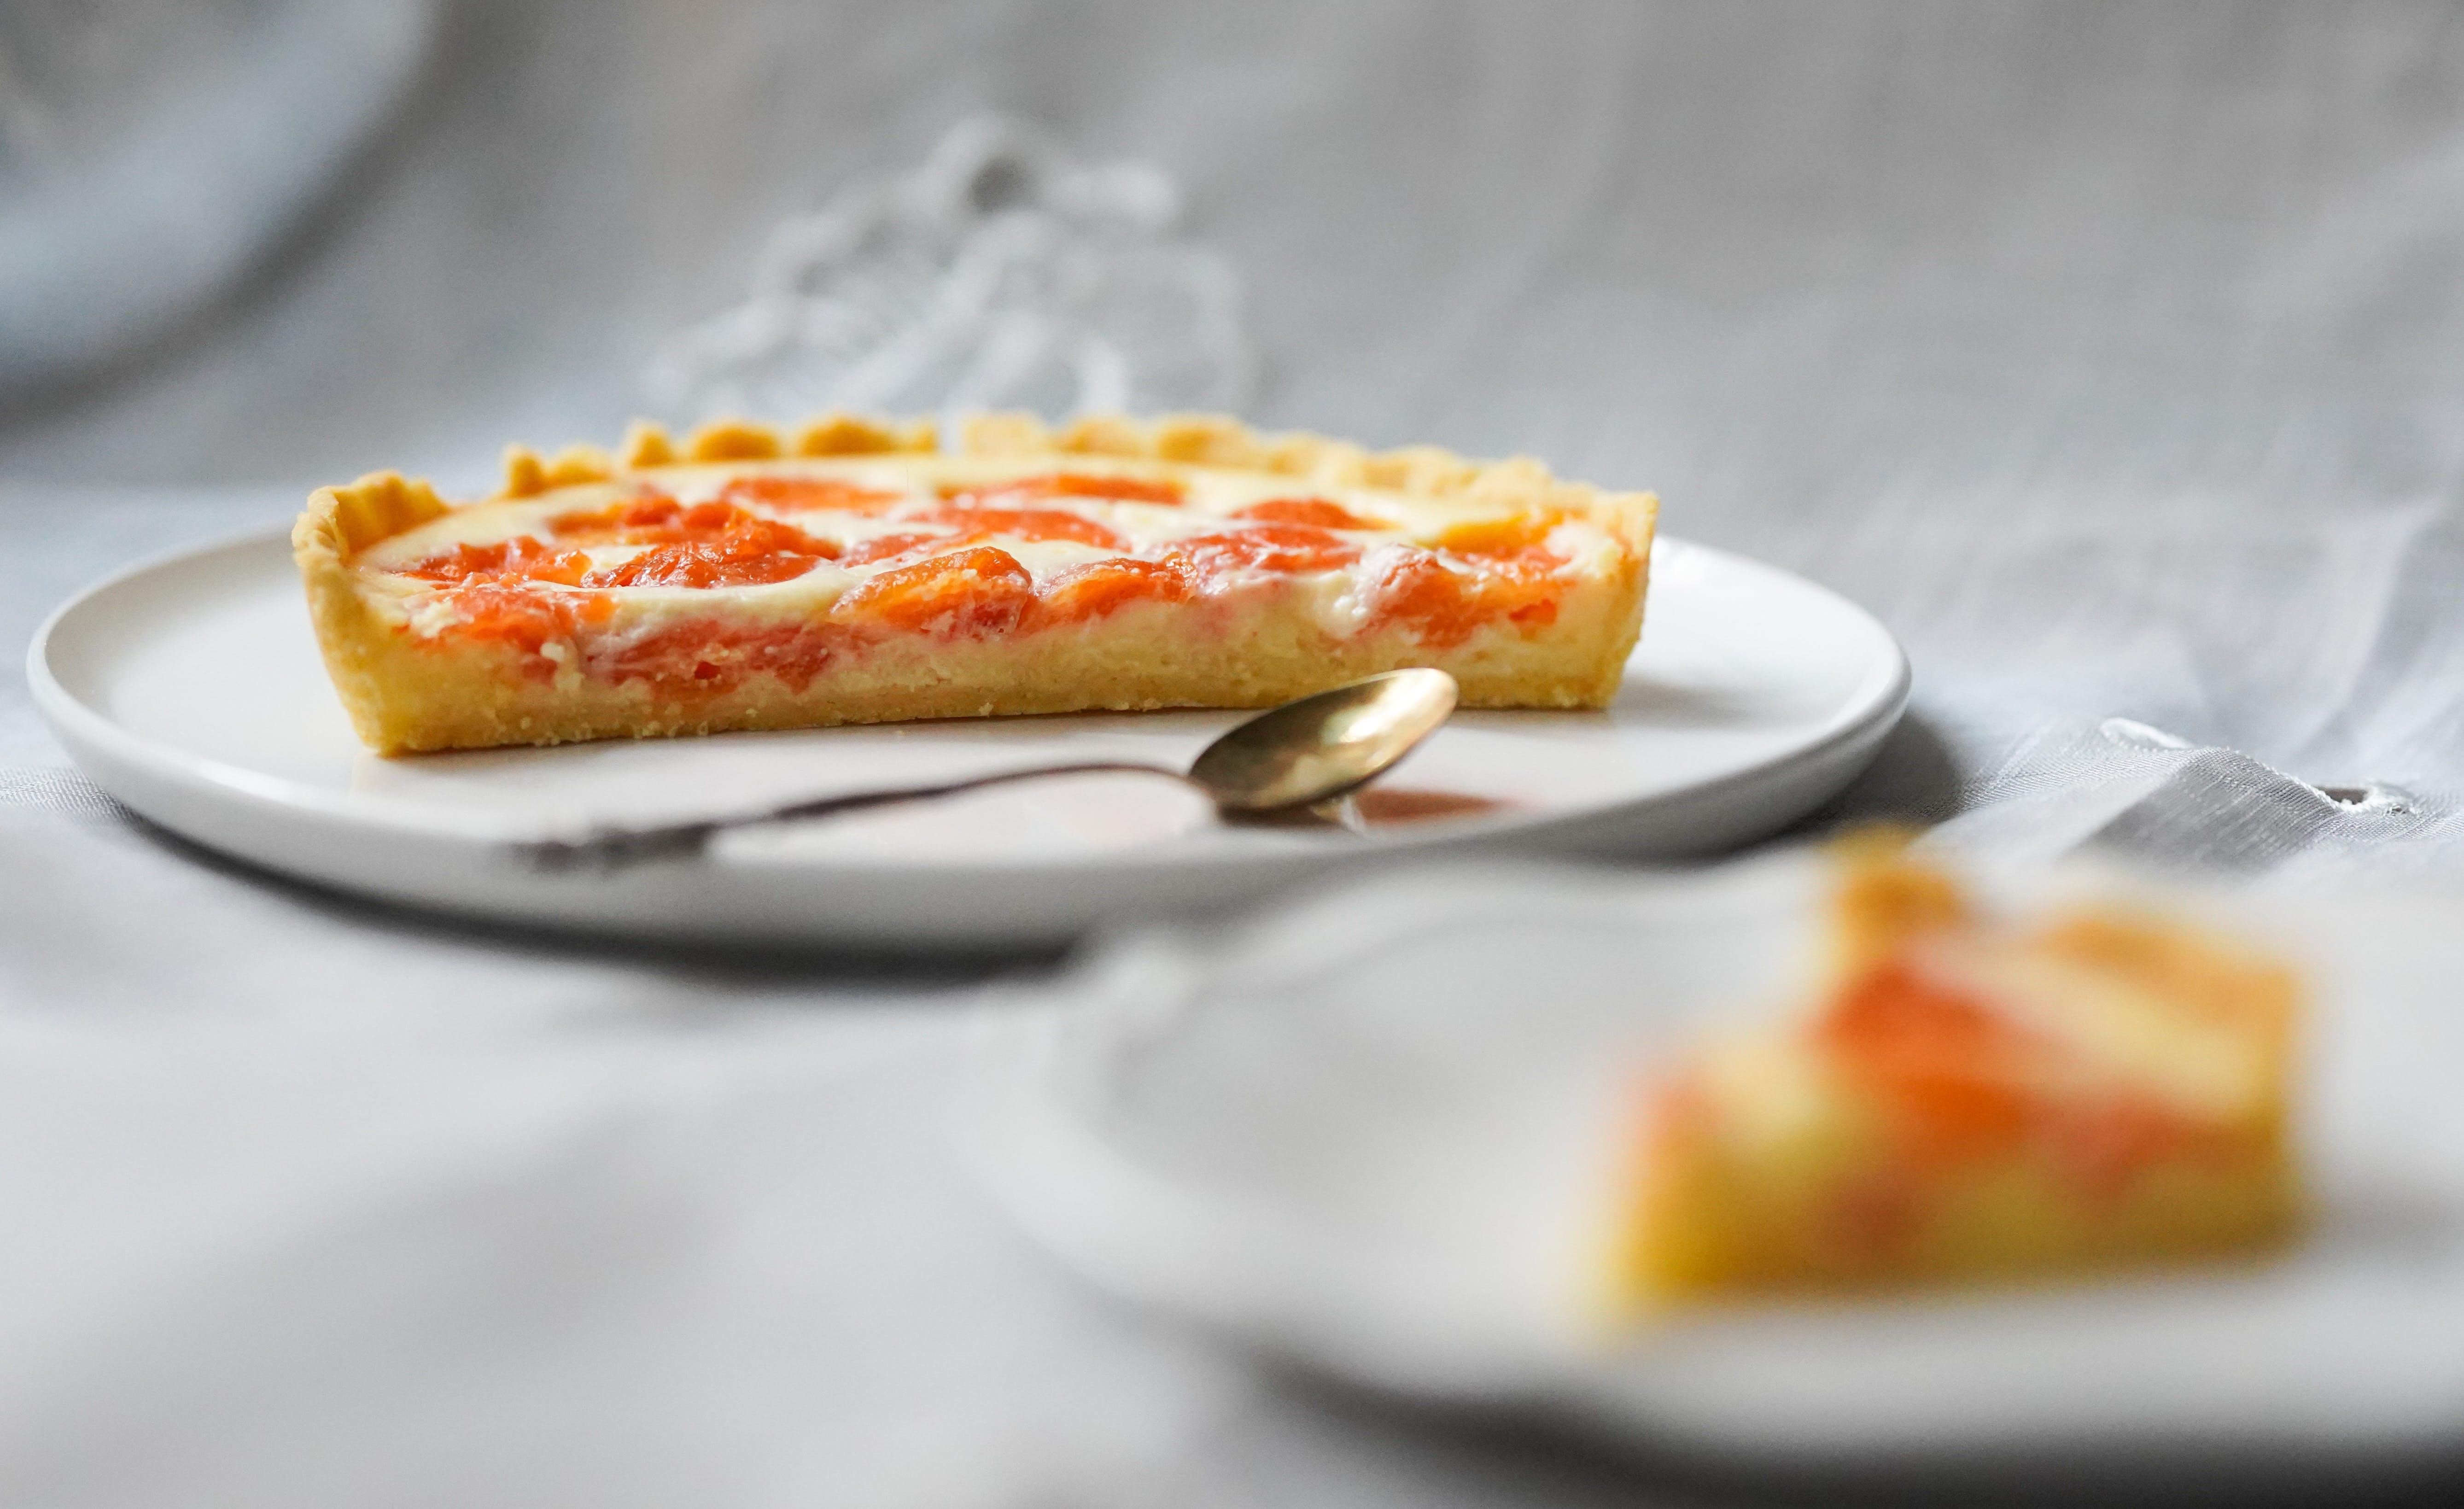 Sliced Pie in Plate